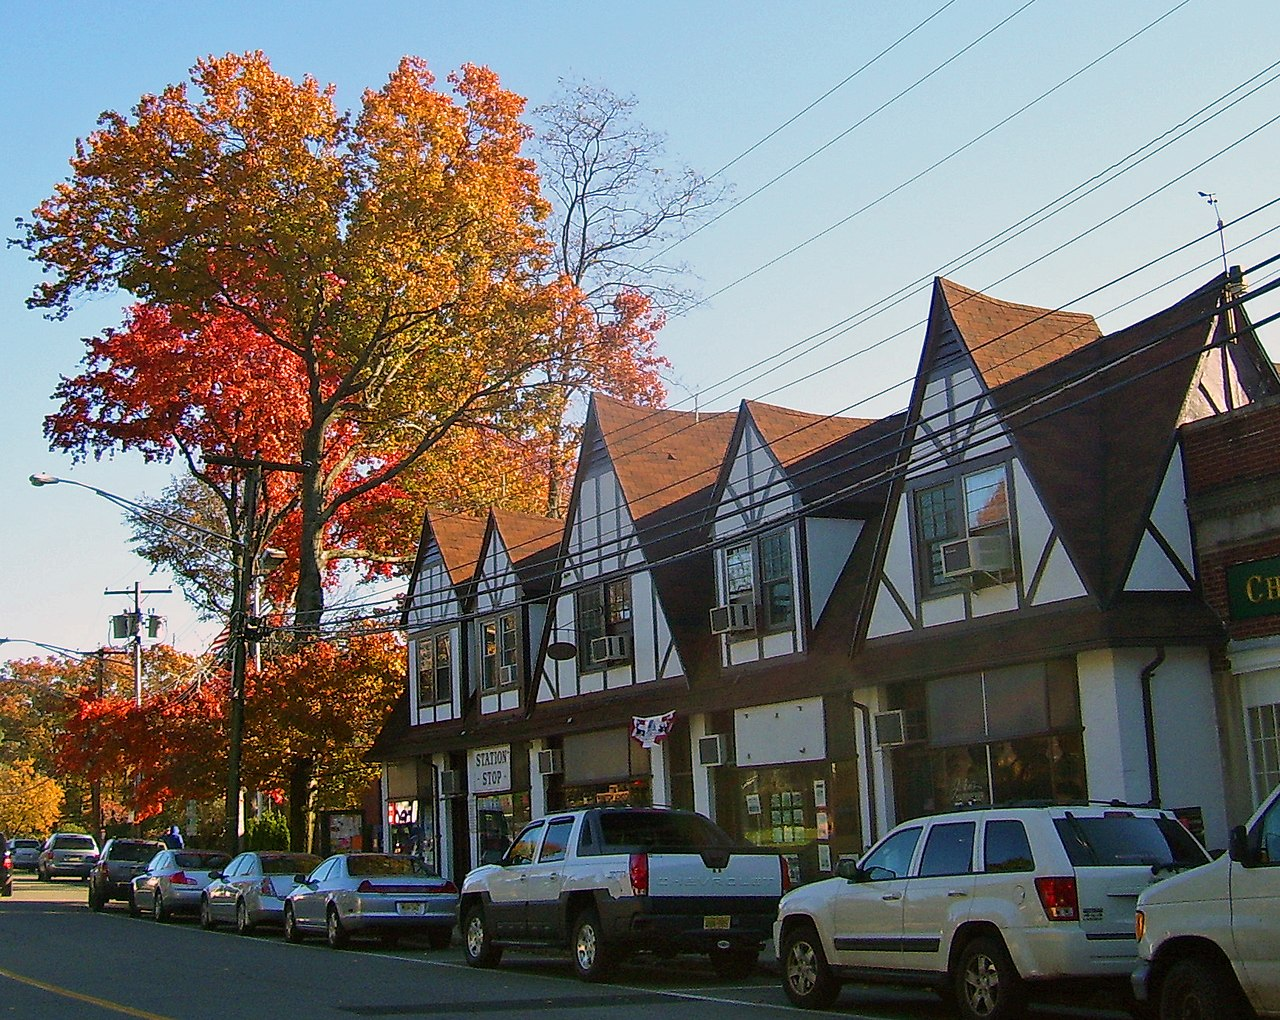 Short Hills (NJ) United States  City pictures : Original file  1,656 × 1,320 pixels, file size: 2.13 MB, MIME ...